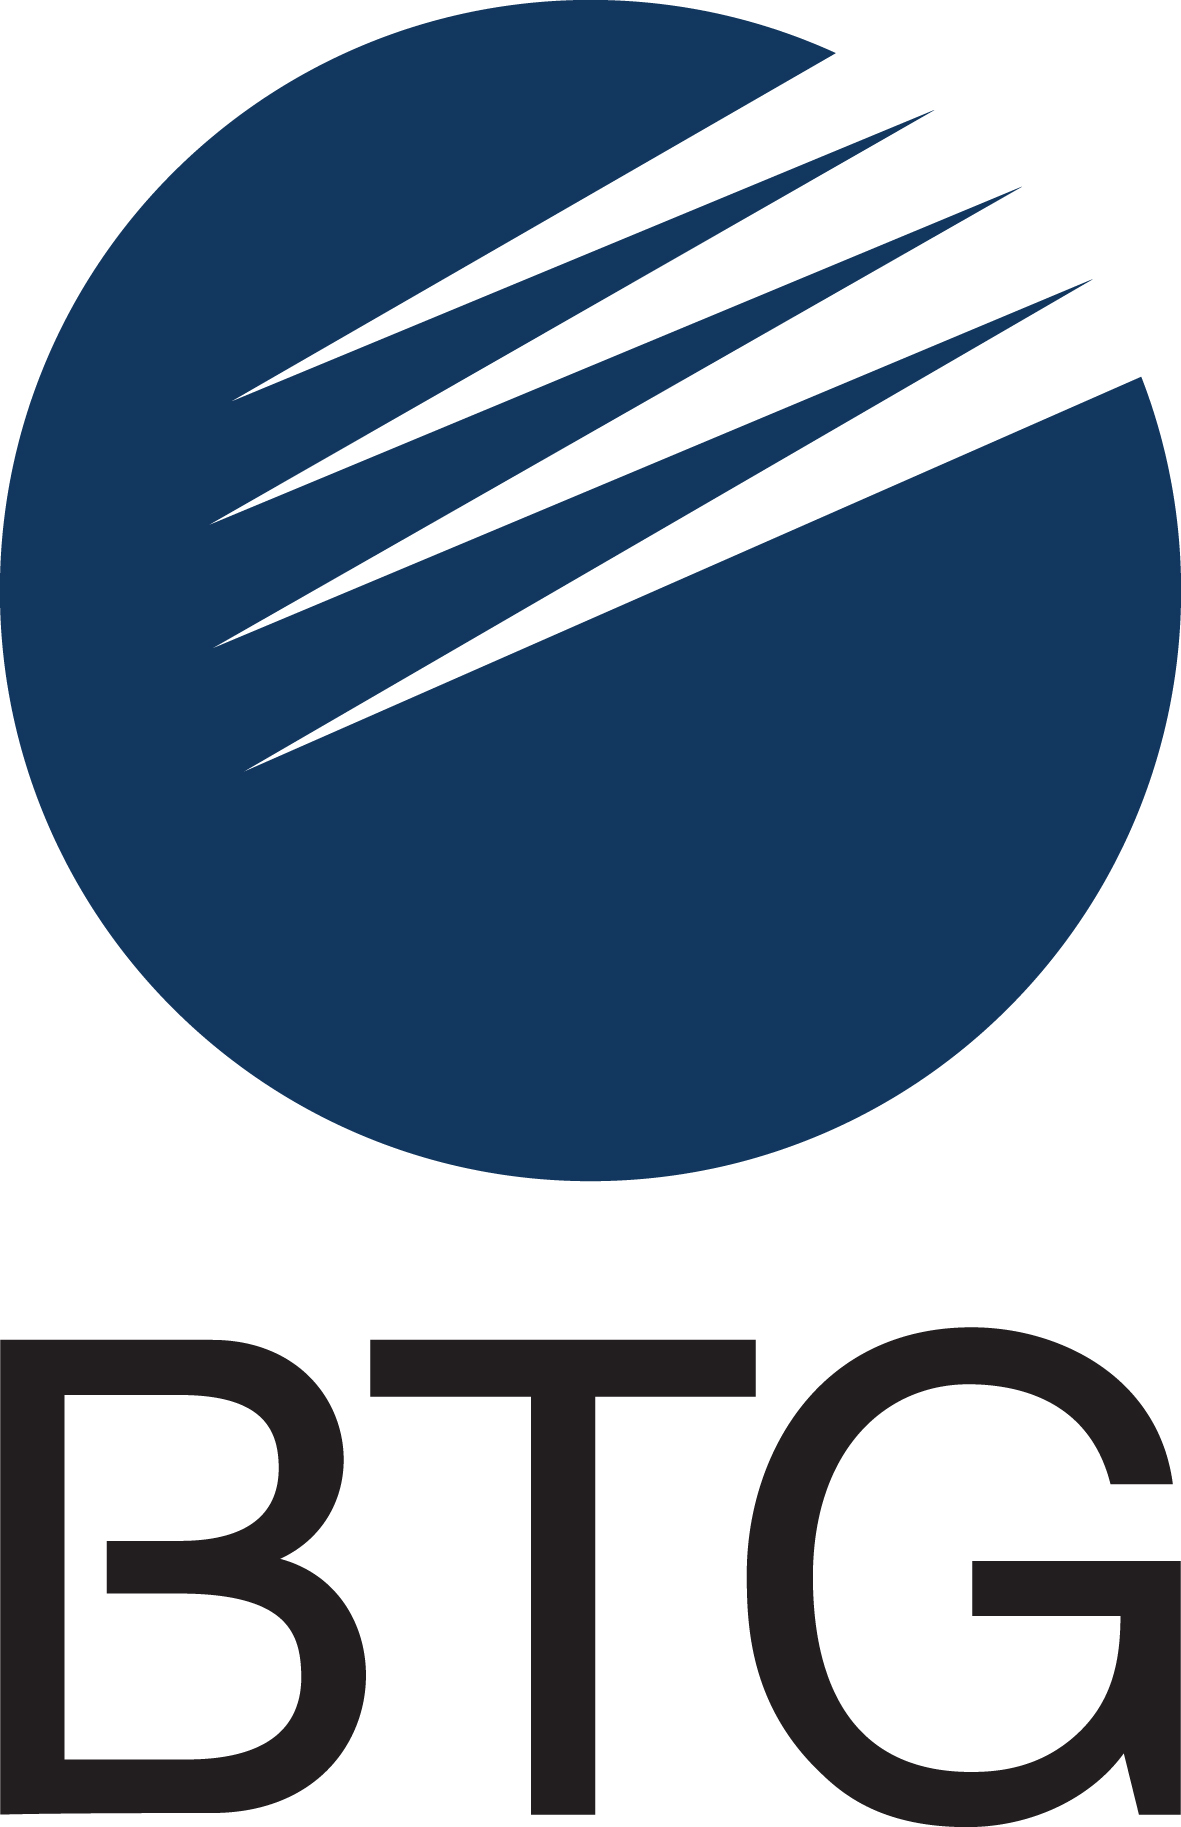 logo logo 标志 设计 矢量 矢量图 素材 图标 1181_1827 竖版 竖屏